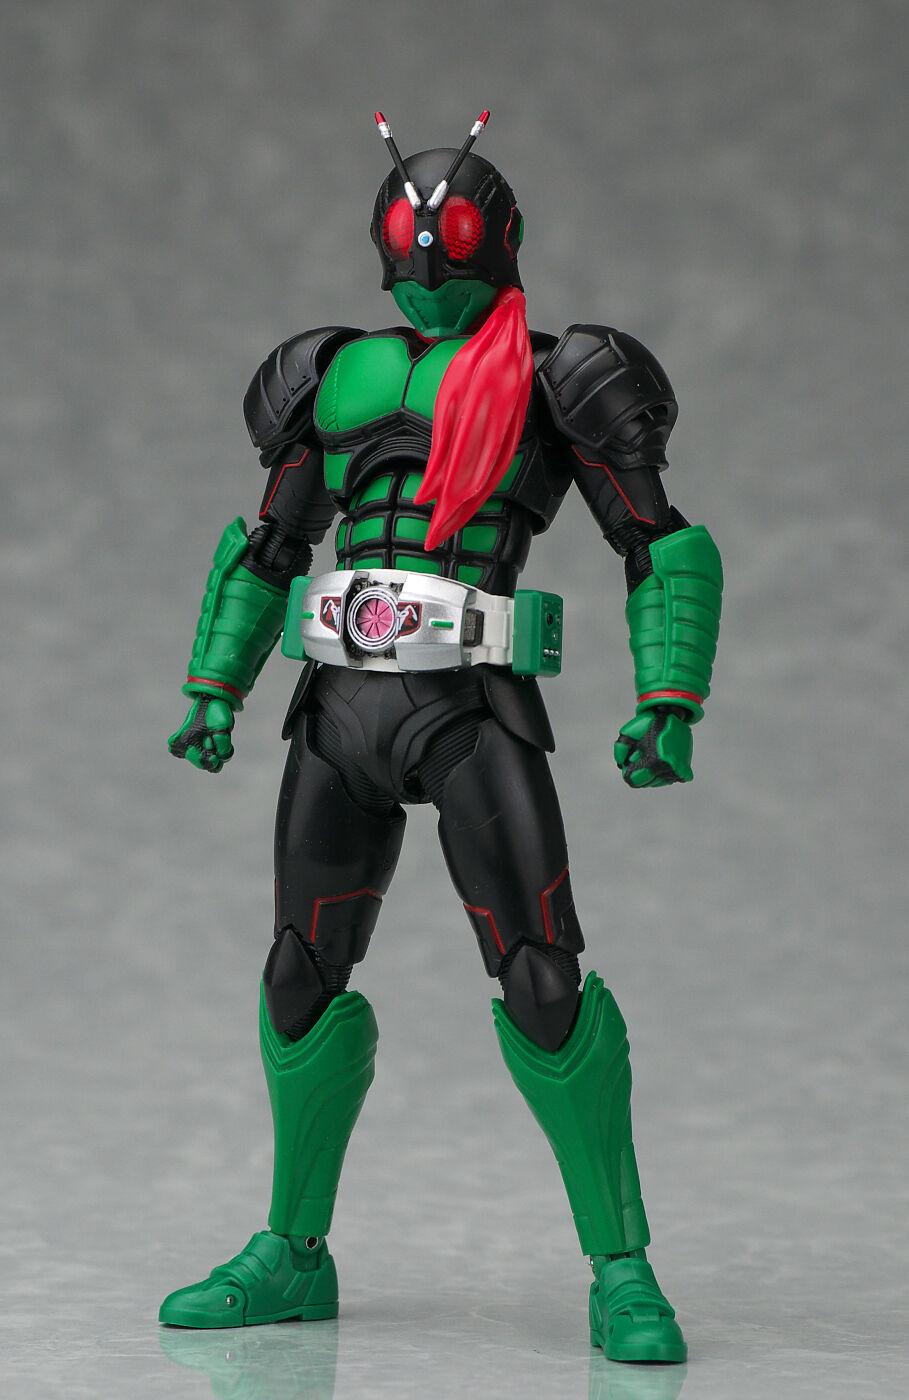 Japan Rare Bandai S.H.Figuarts Masked Kamen Rider 1 Gou Renewal Action Figure